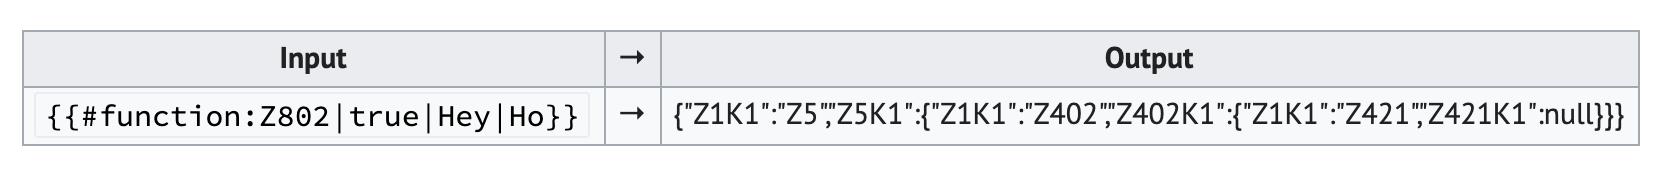 image.png (174×1 px, 28 KB)